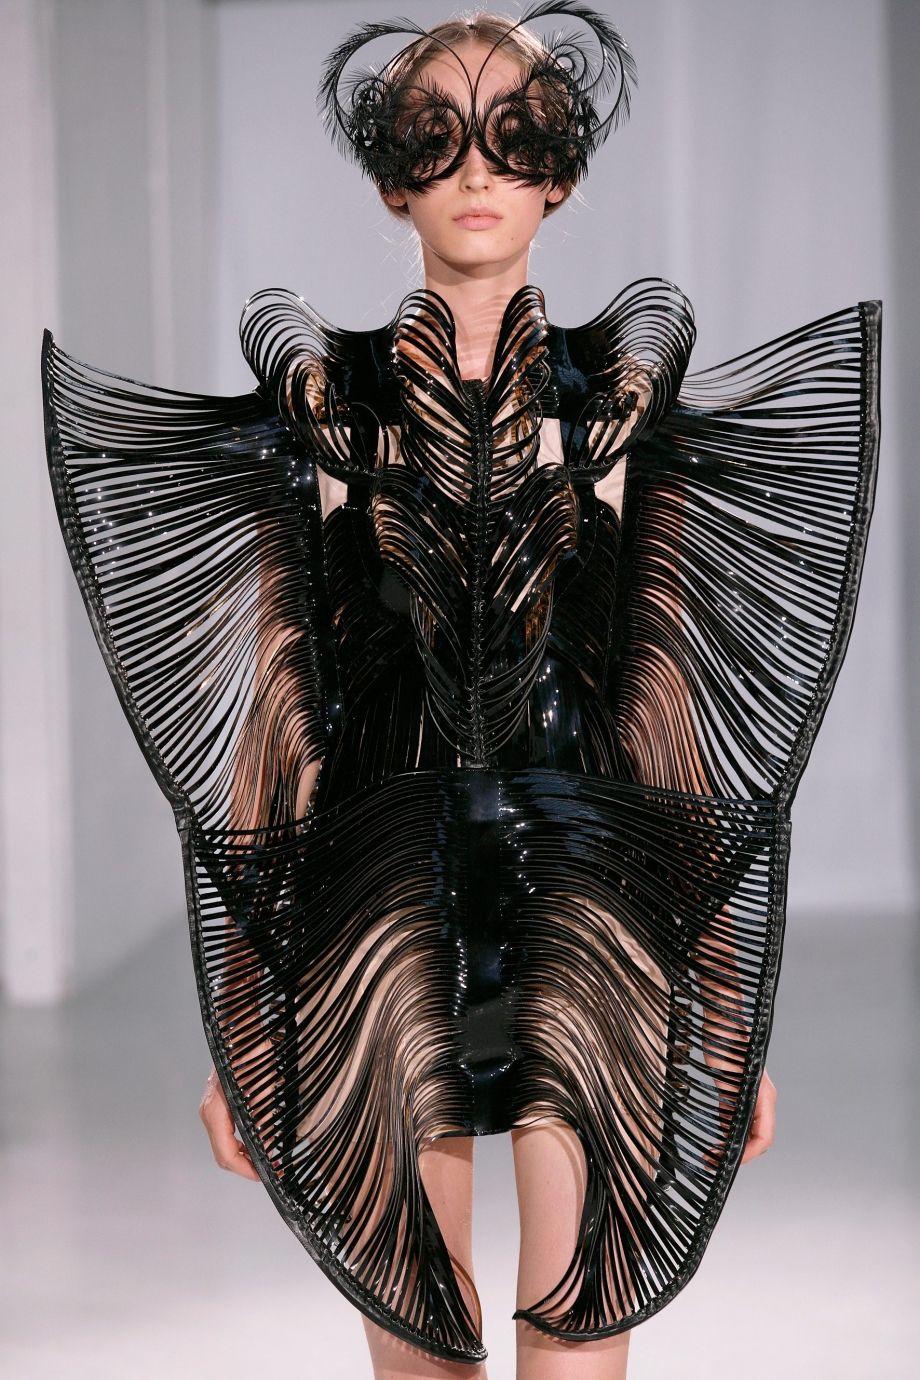 Capriole Couture Iris Van Herpen Conceptual Fashion Iris Van